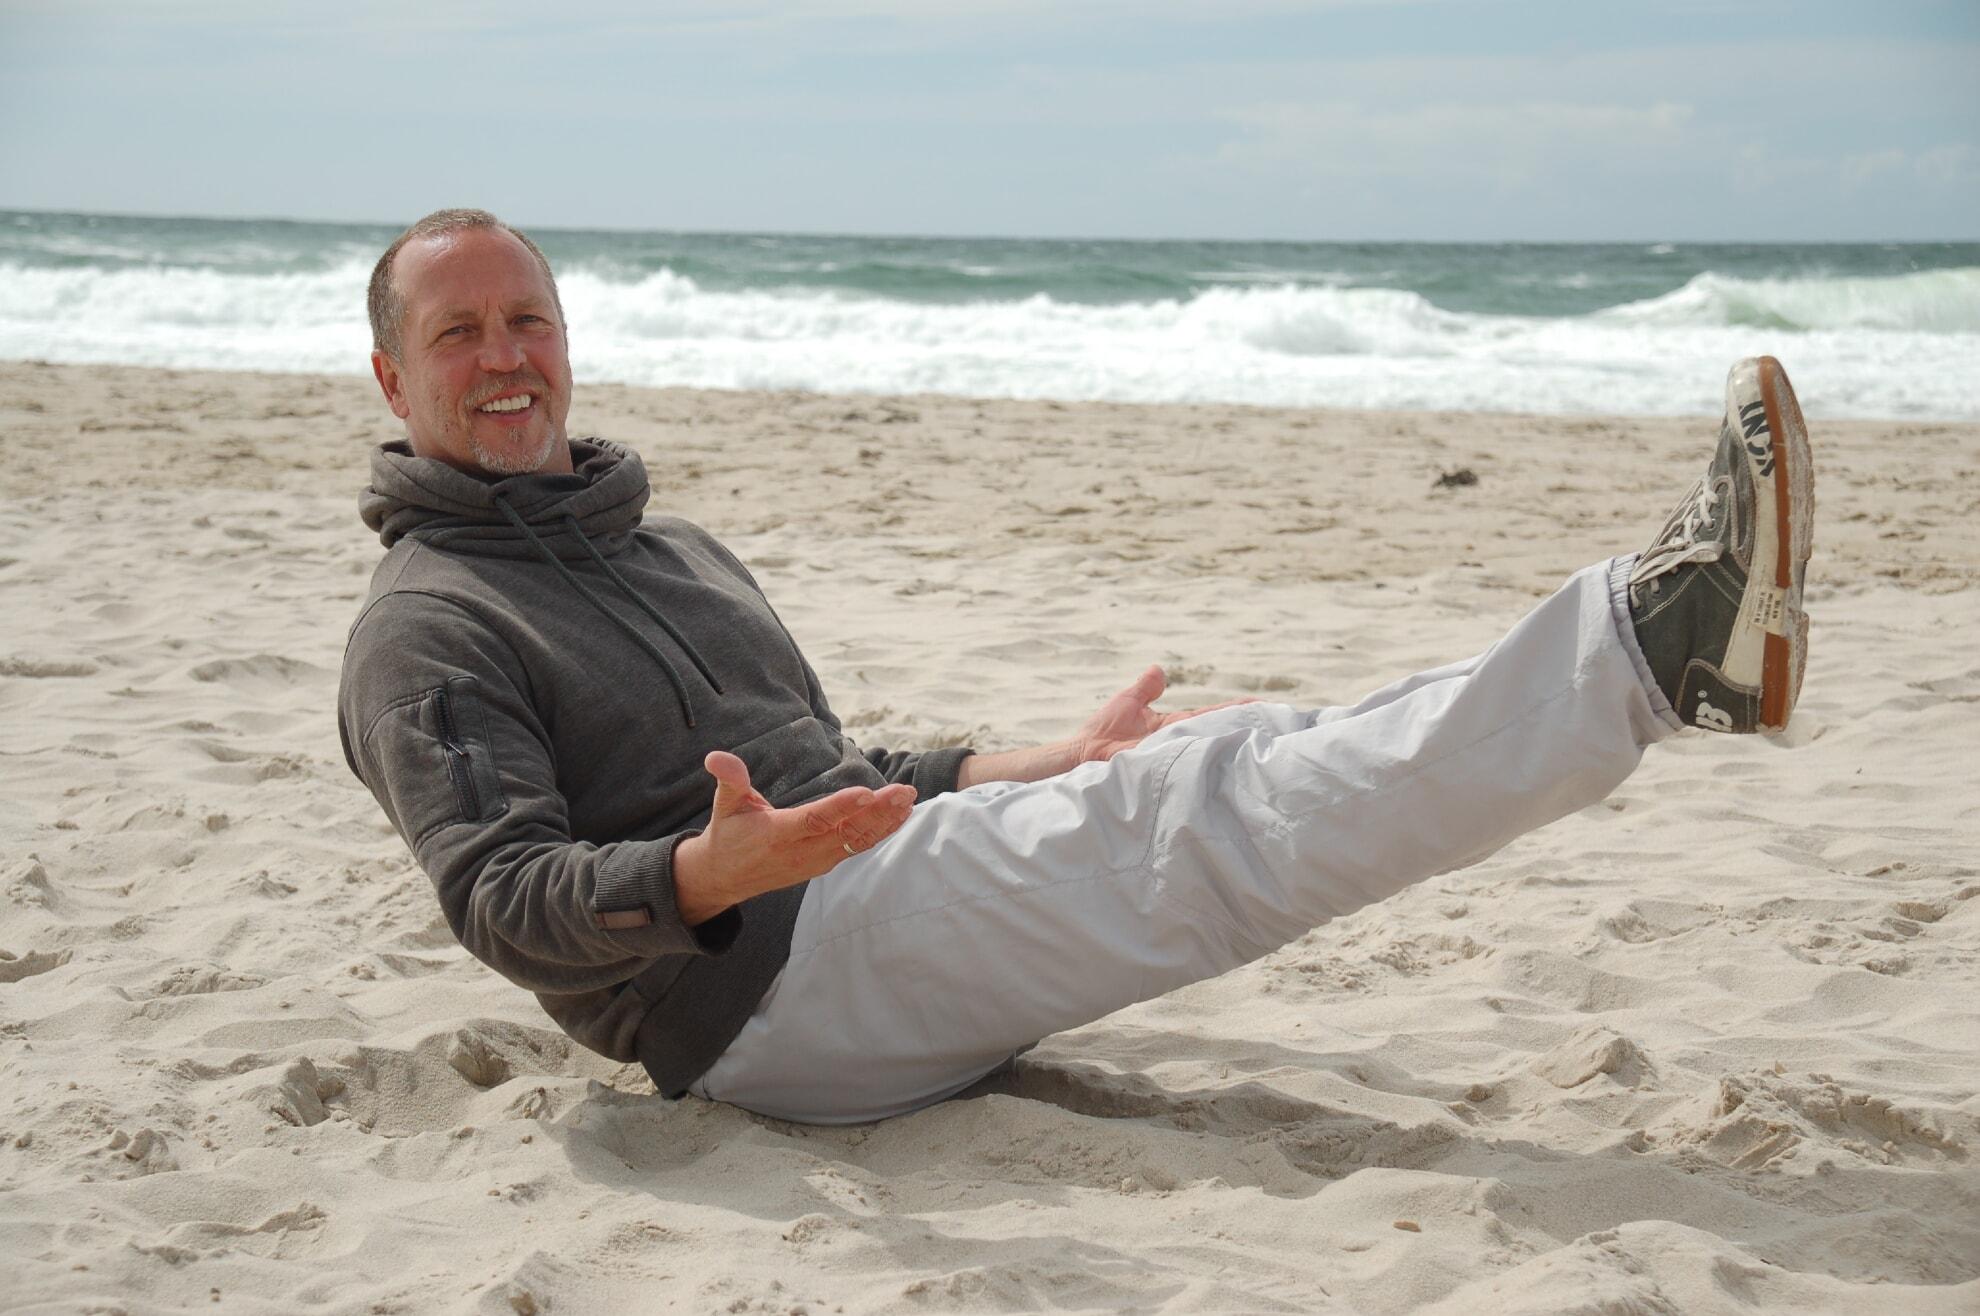 Personaltrainer Rainer Grunow